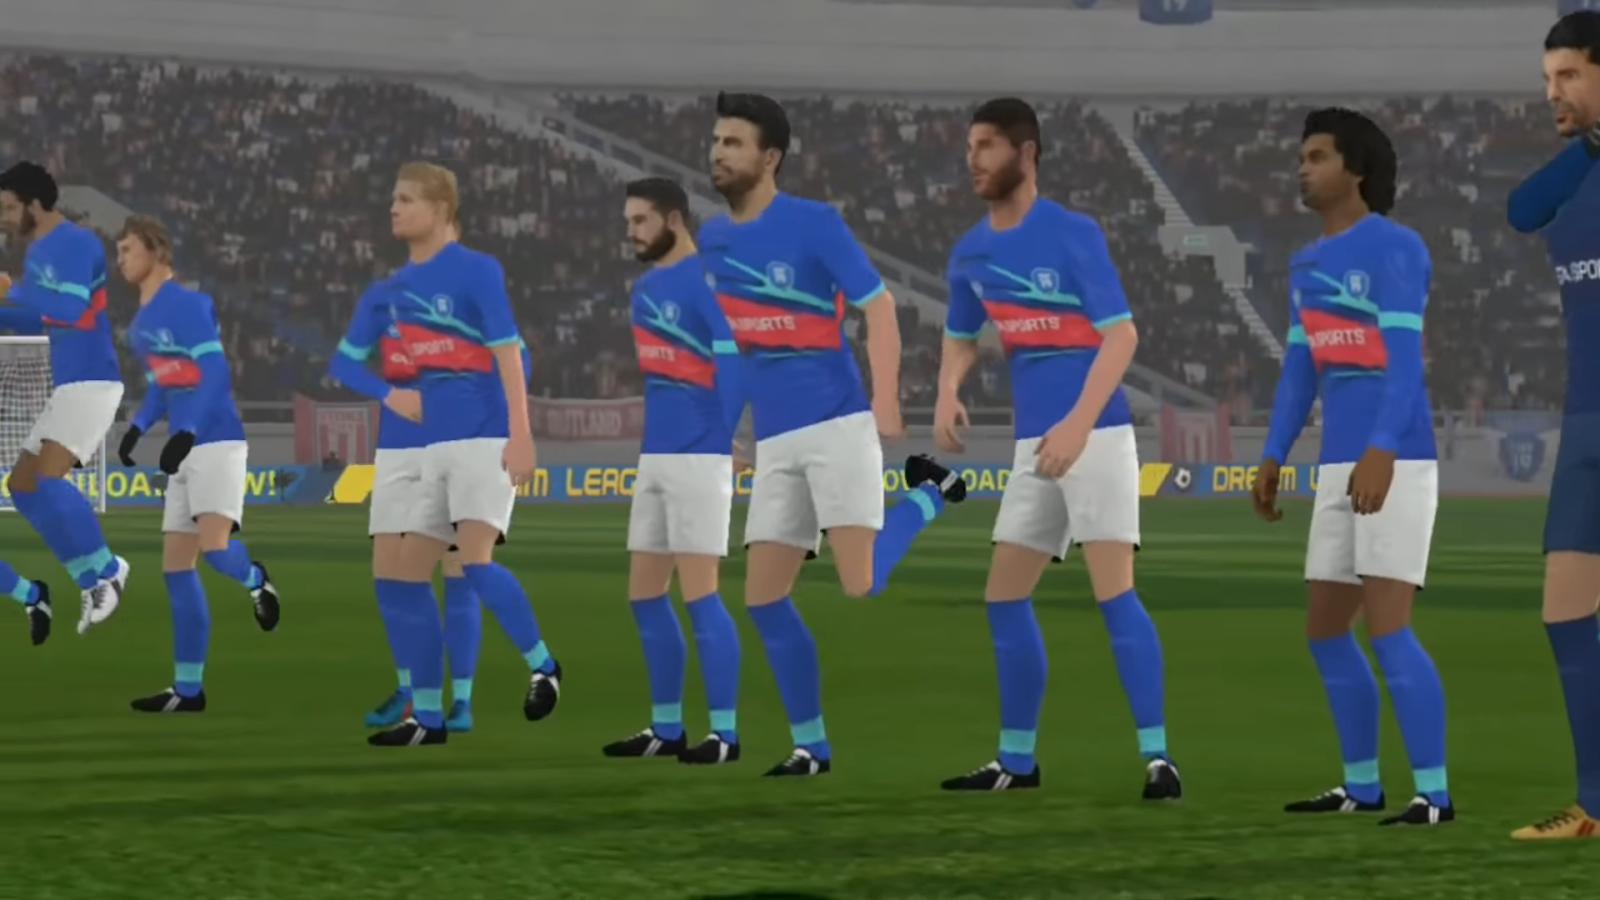 تحميل دريم ليج 2020 للموبايل اندرويد مهكرة 20 dream league